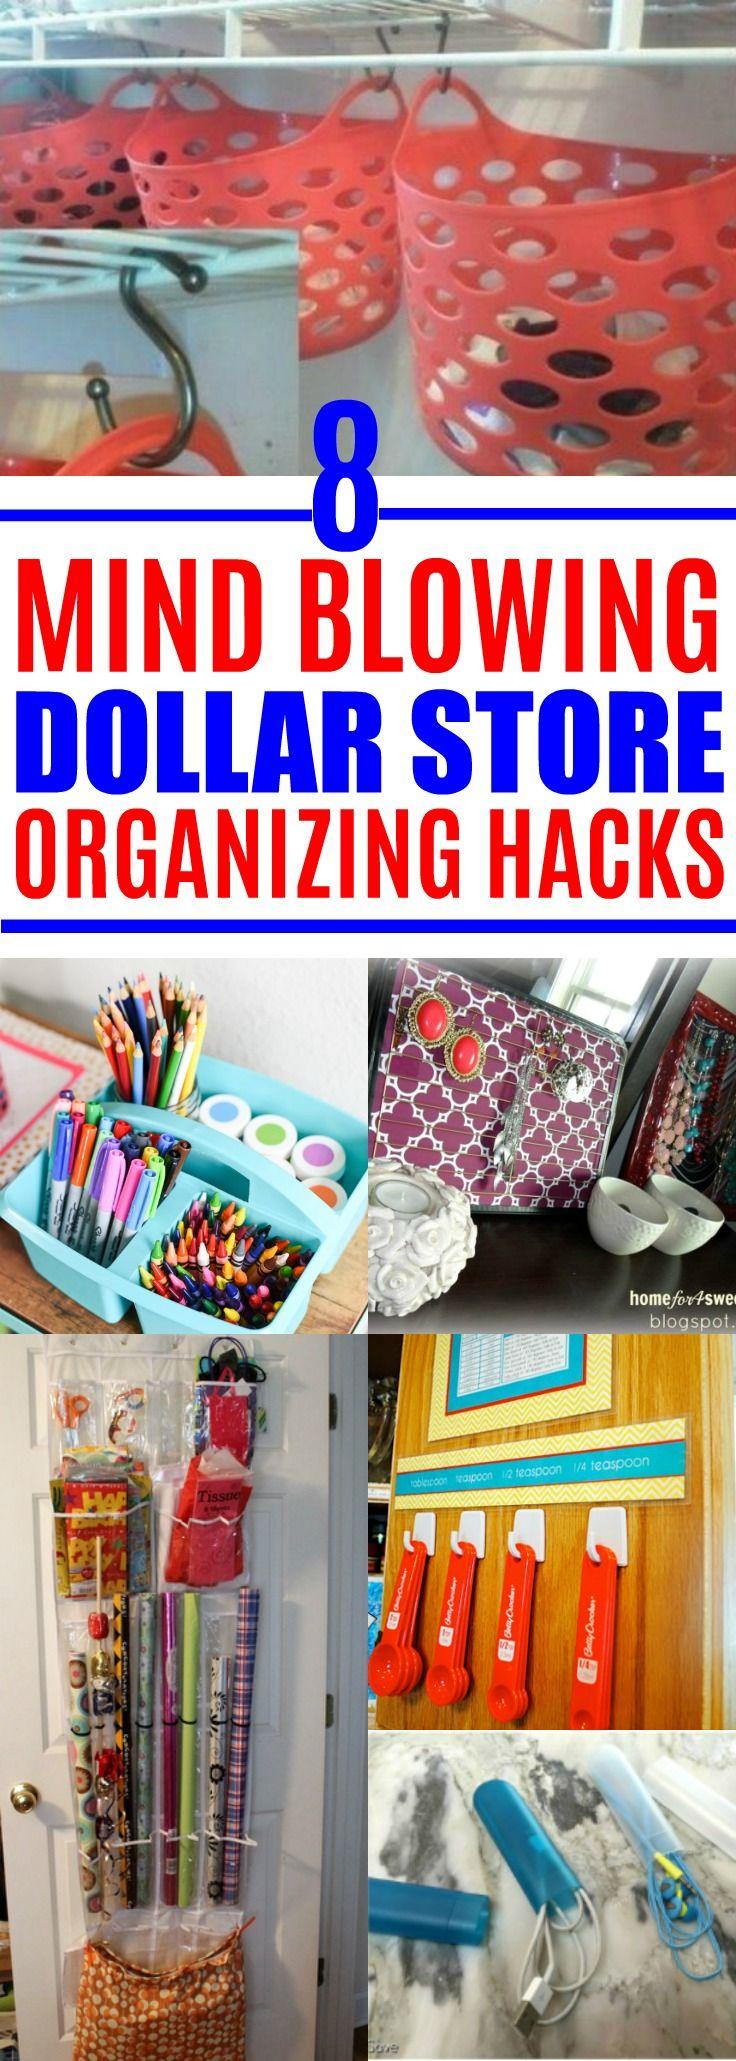 Dollar Store Organizing Ideas